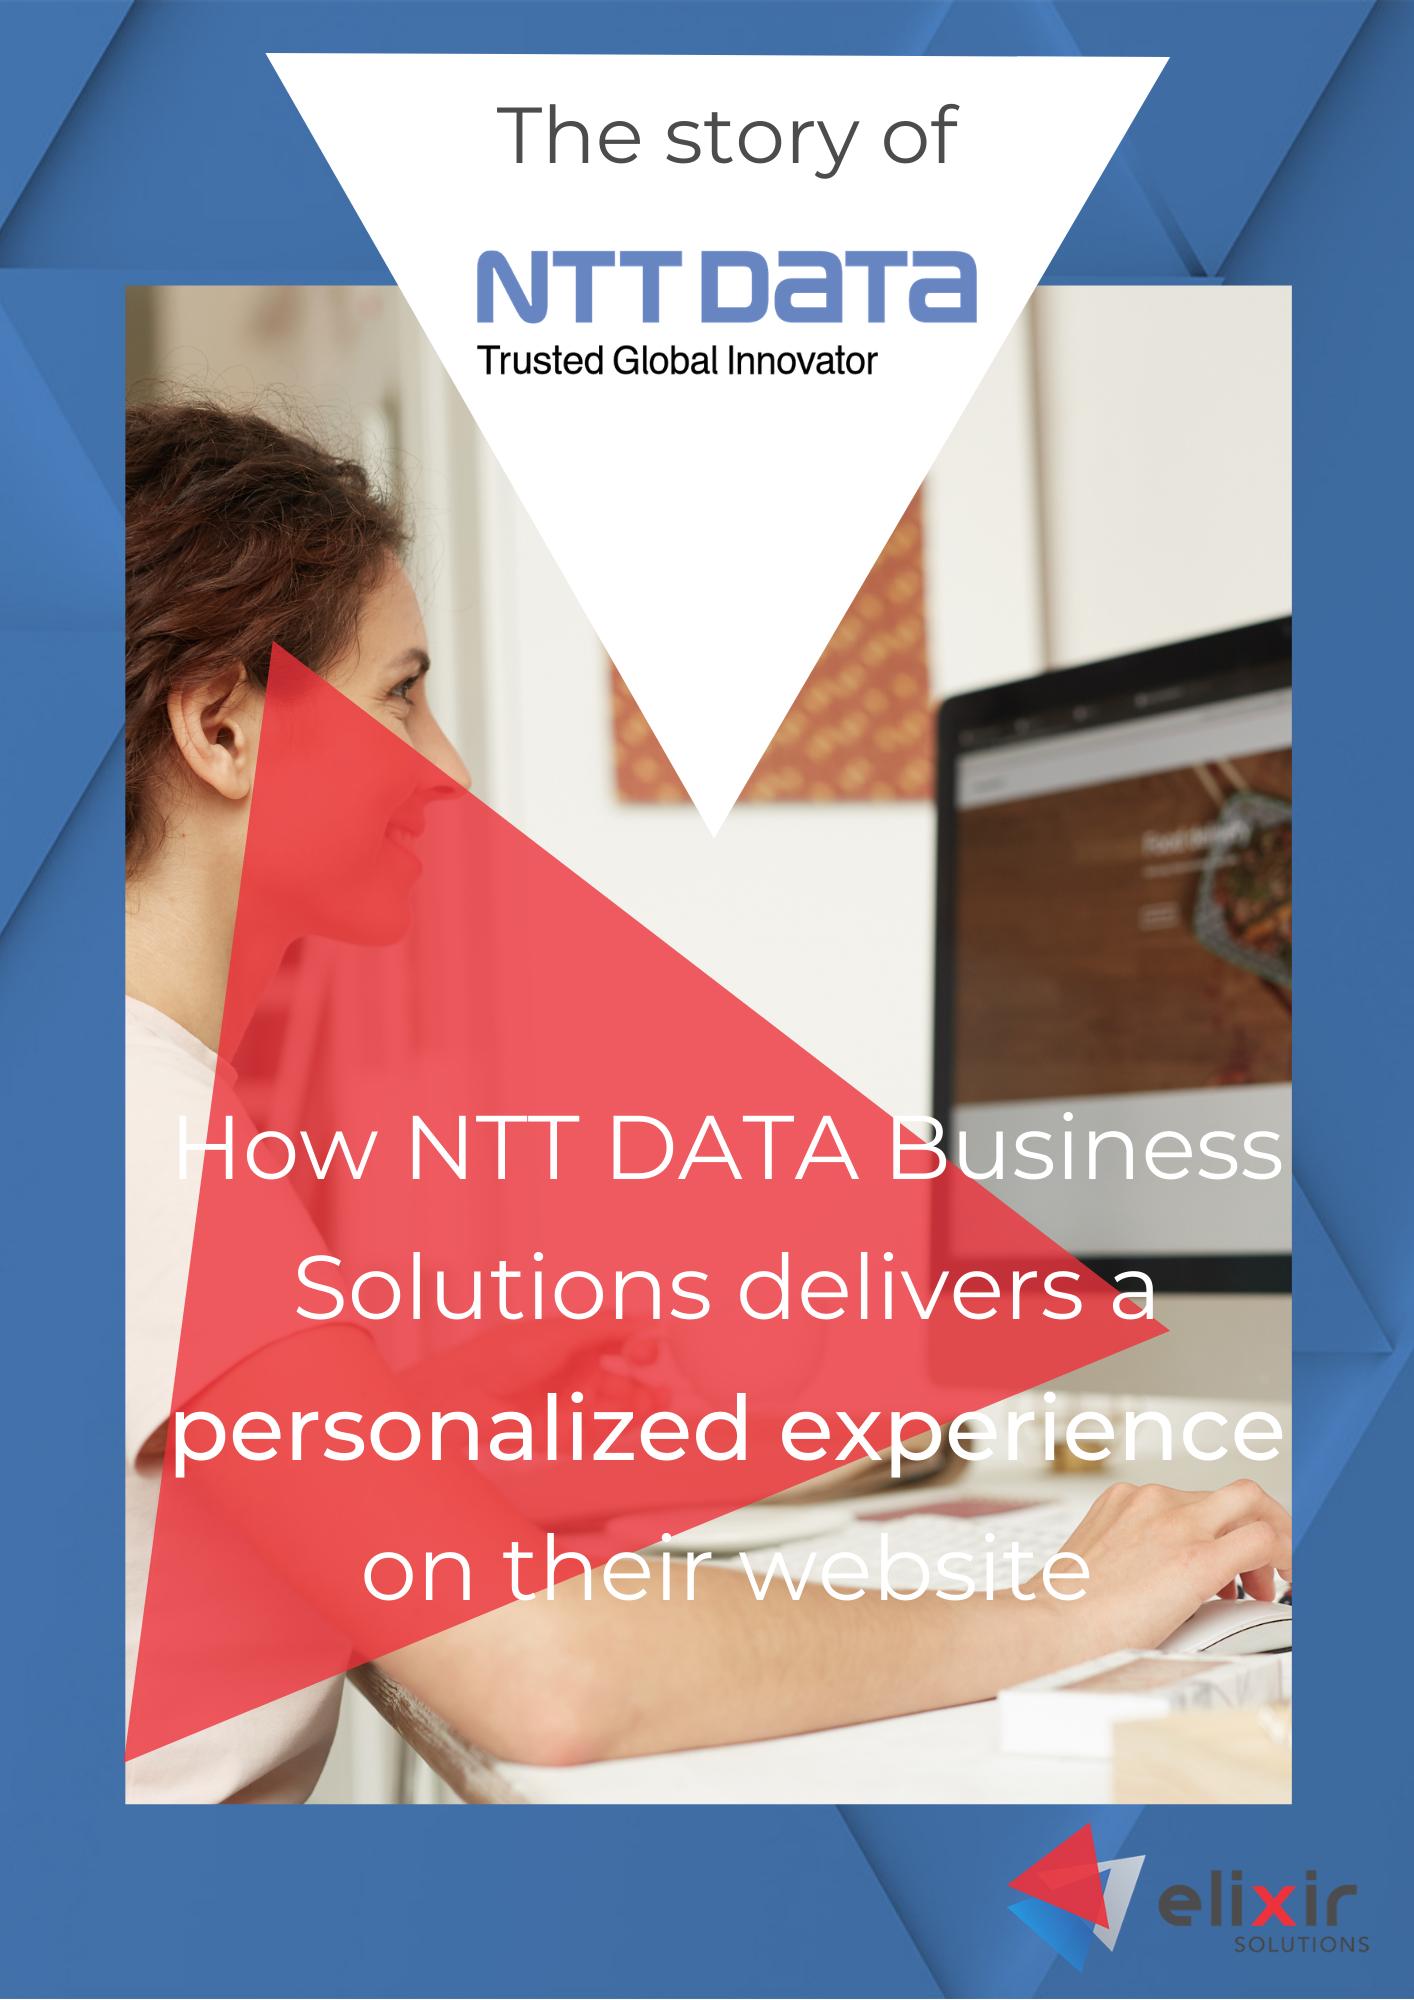 Customer cases cover ntt data business solutions